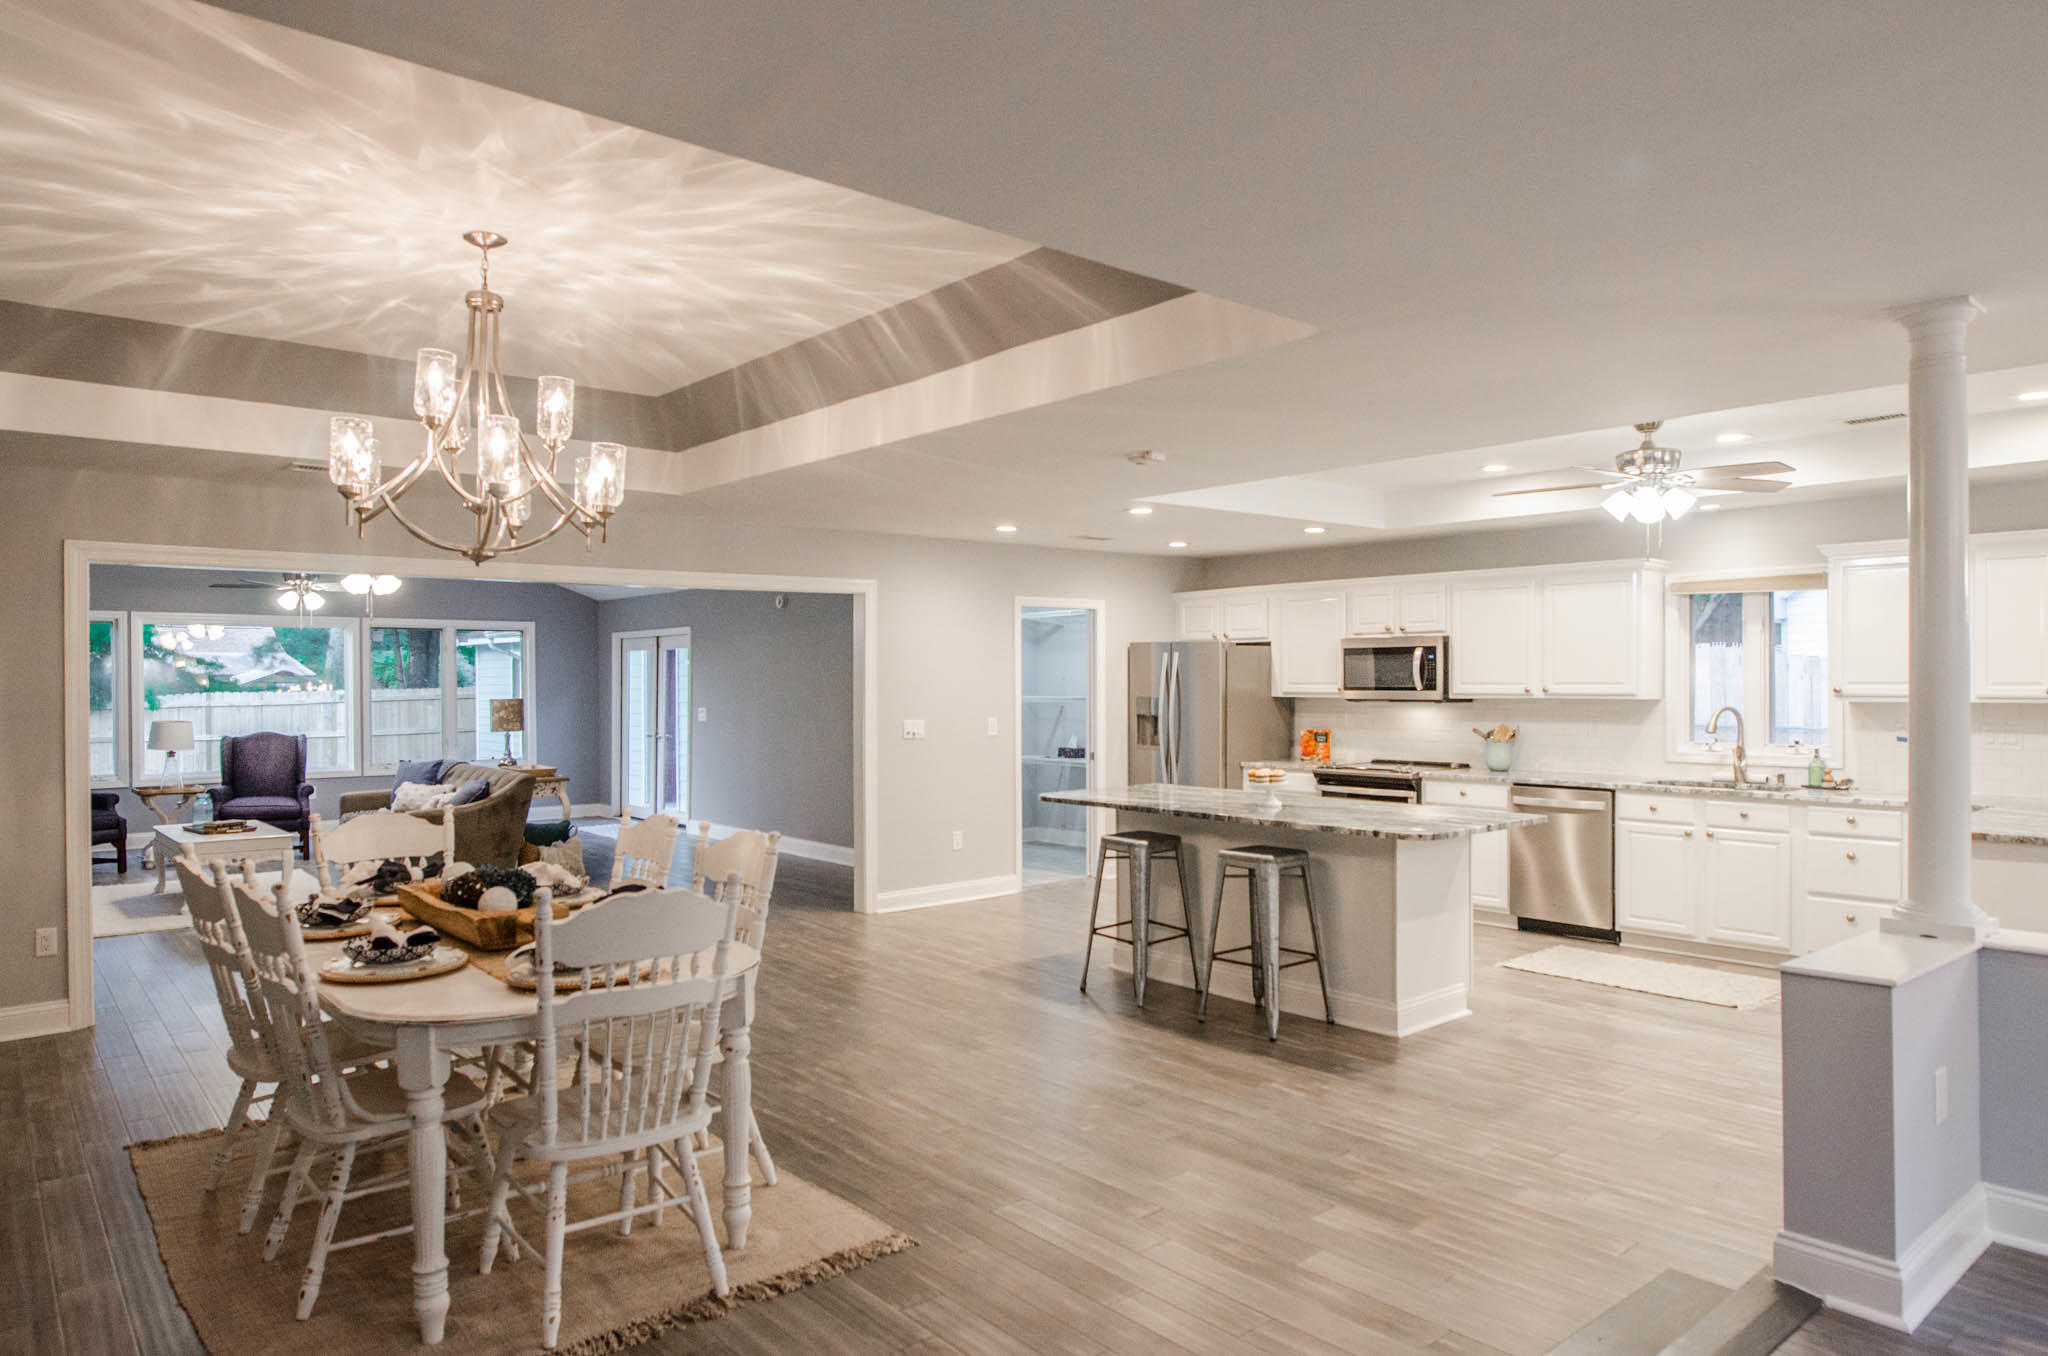 Covington Hills Homes For Sale - 5886 Ryans Bluff, North Charleston, SC - 8